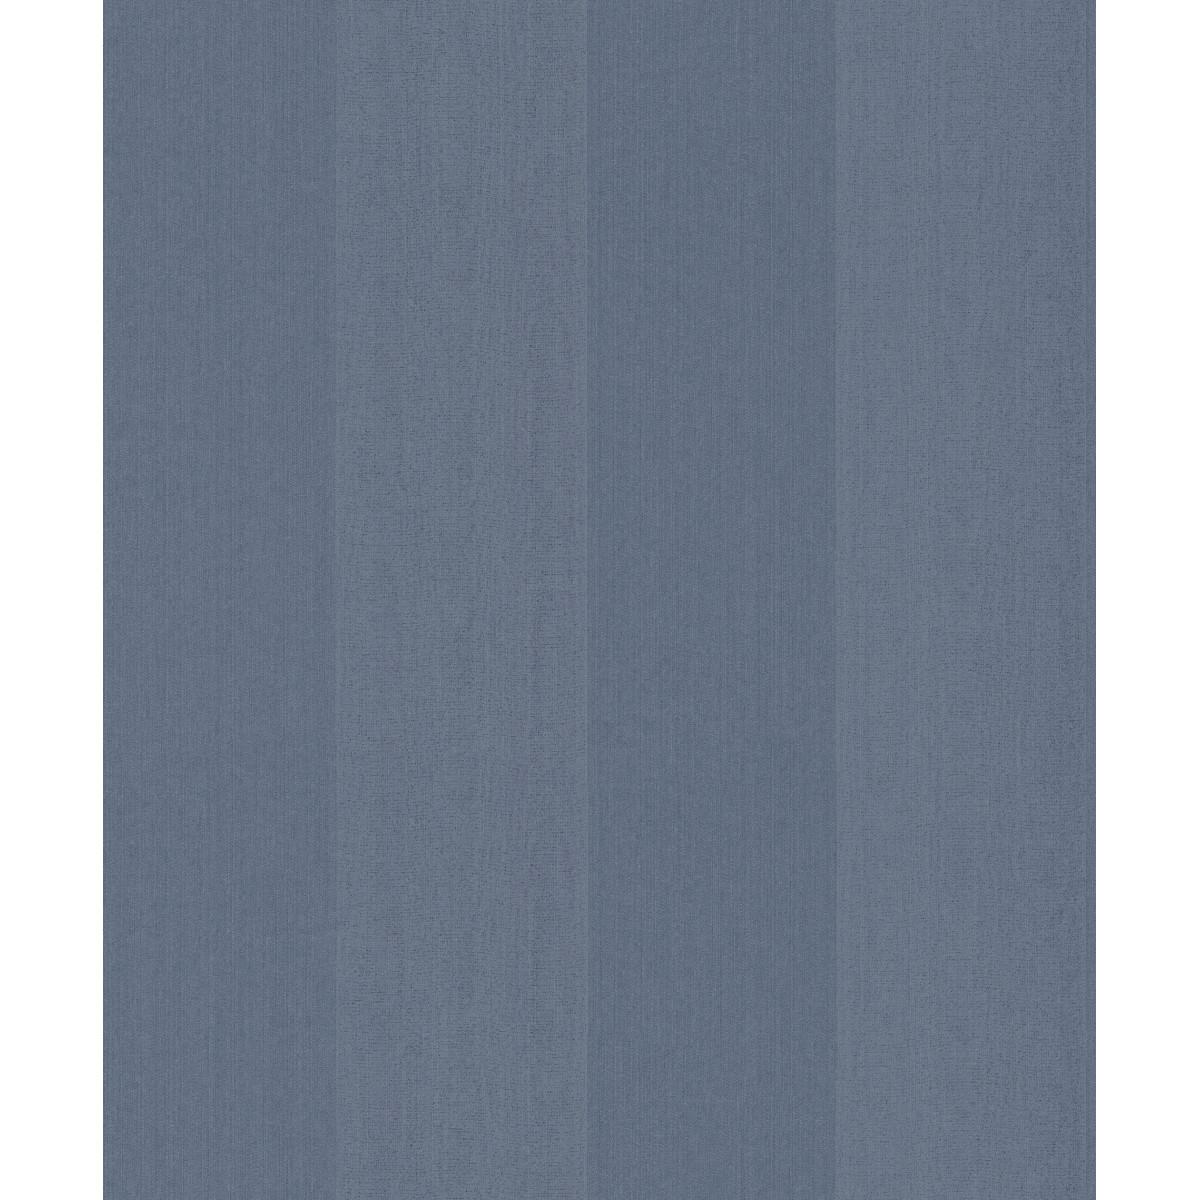 Обои текстильные Architects Paper Haute Couture3 синие 0.53 м 2907-62